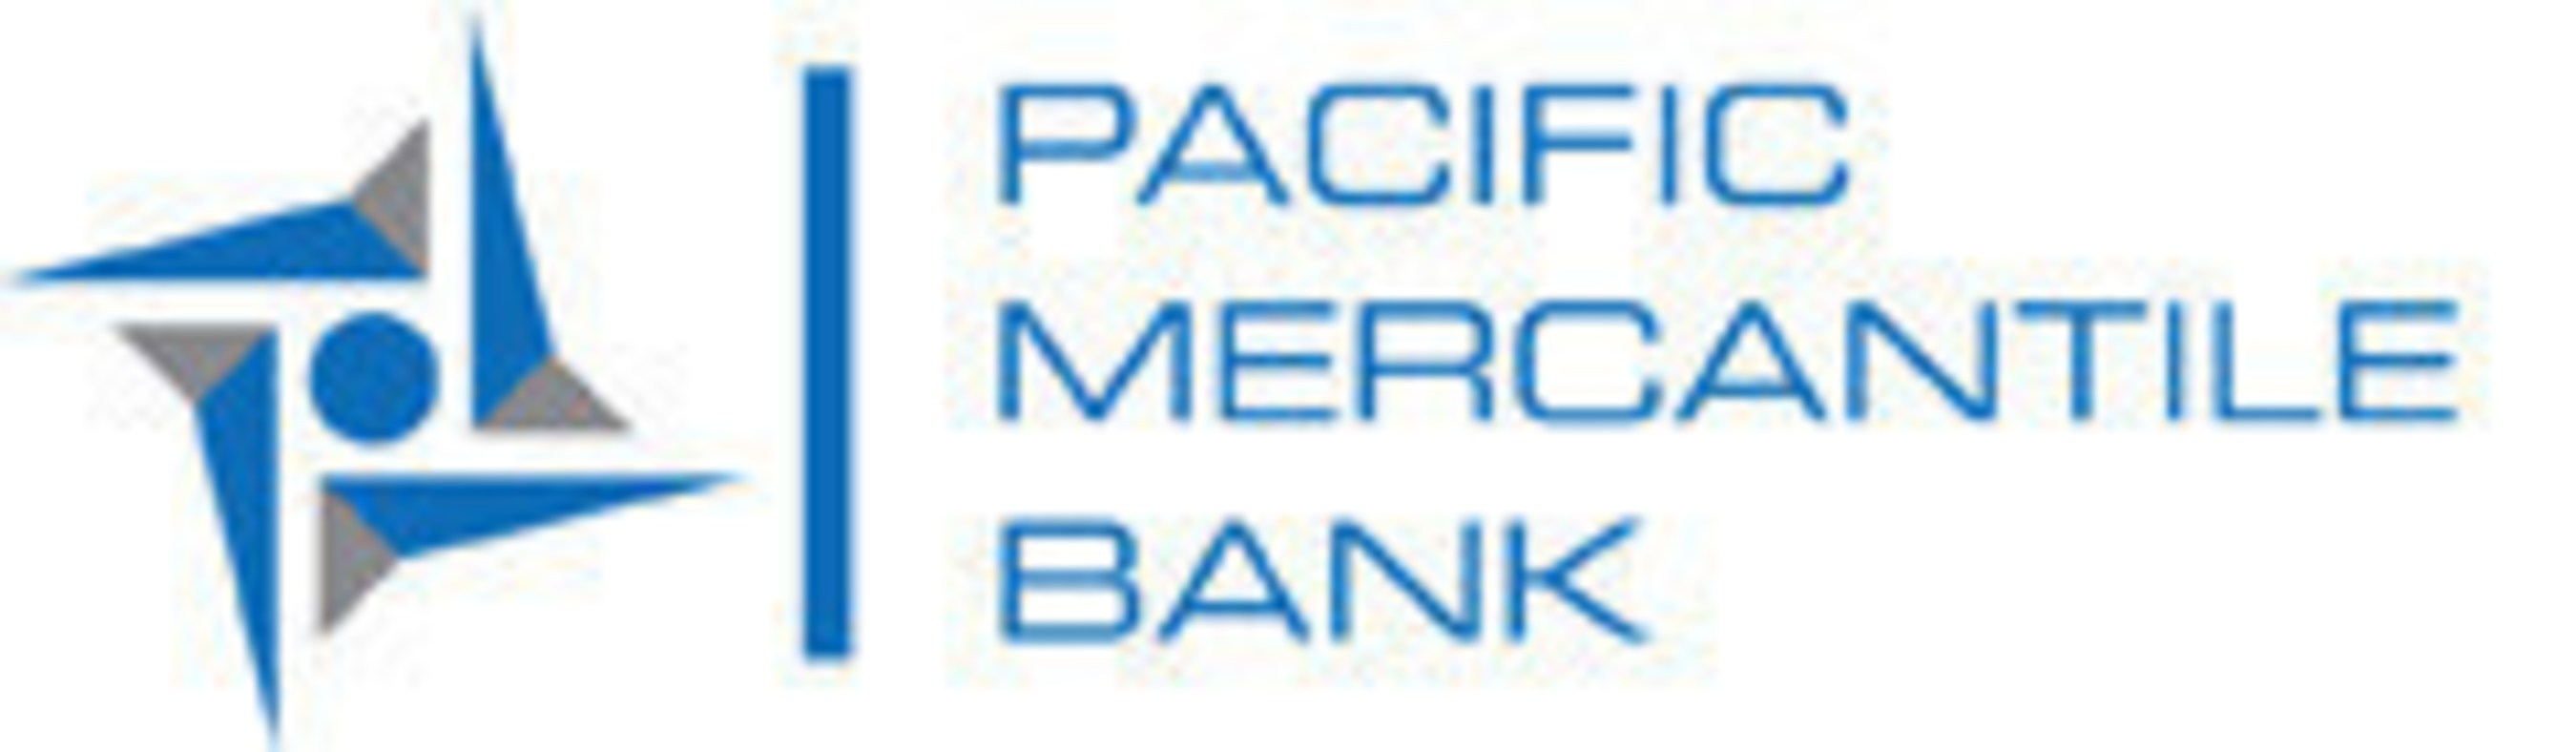 Pacific Mercantile Bank-Financed Feature MOMENTUM Starring Olga Kurylenko and James Purefoy Acquired by Starz